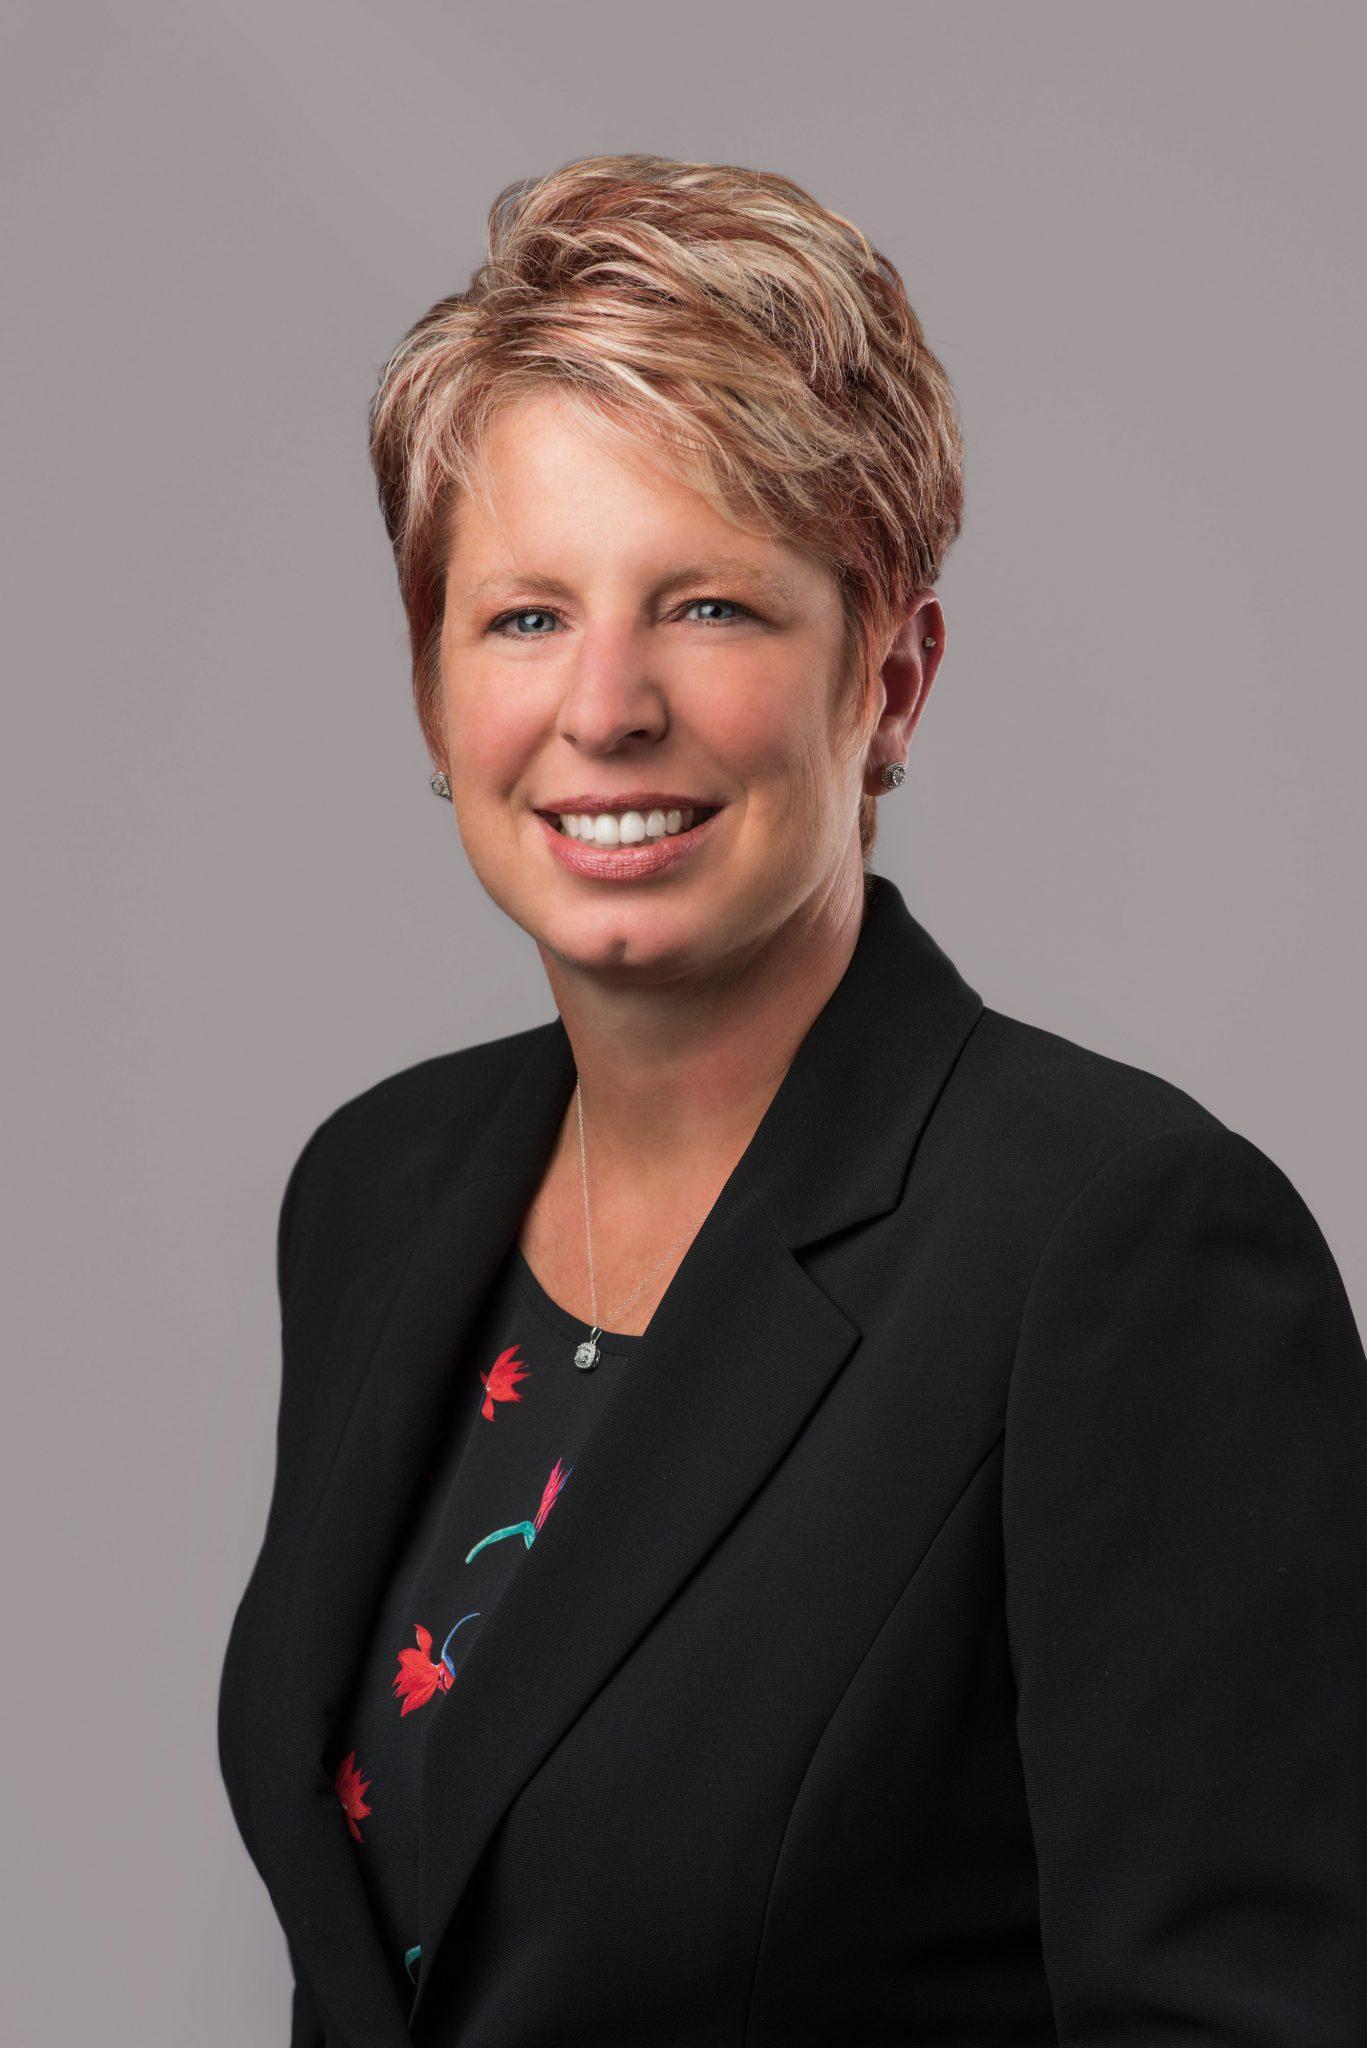 Tracy Wirth, BSN, MEN, FNP-BC